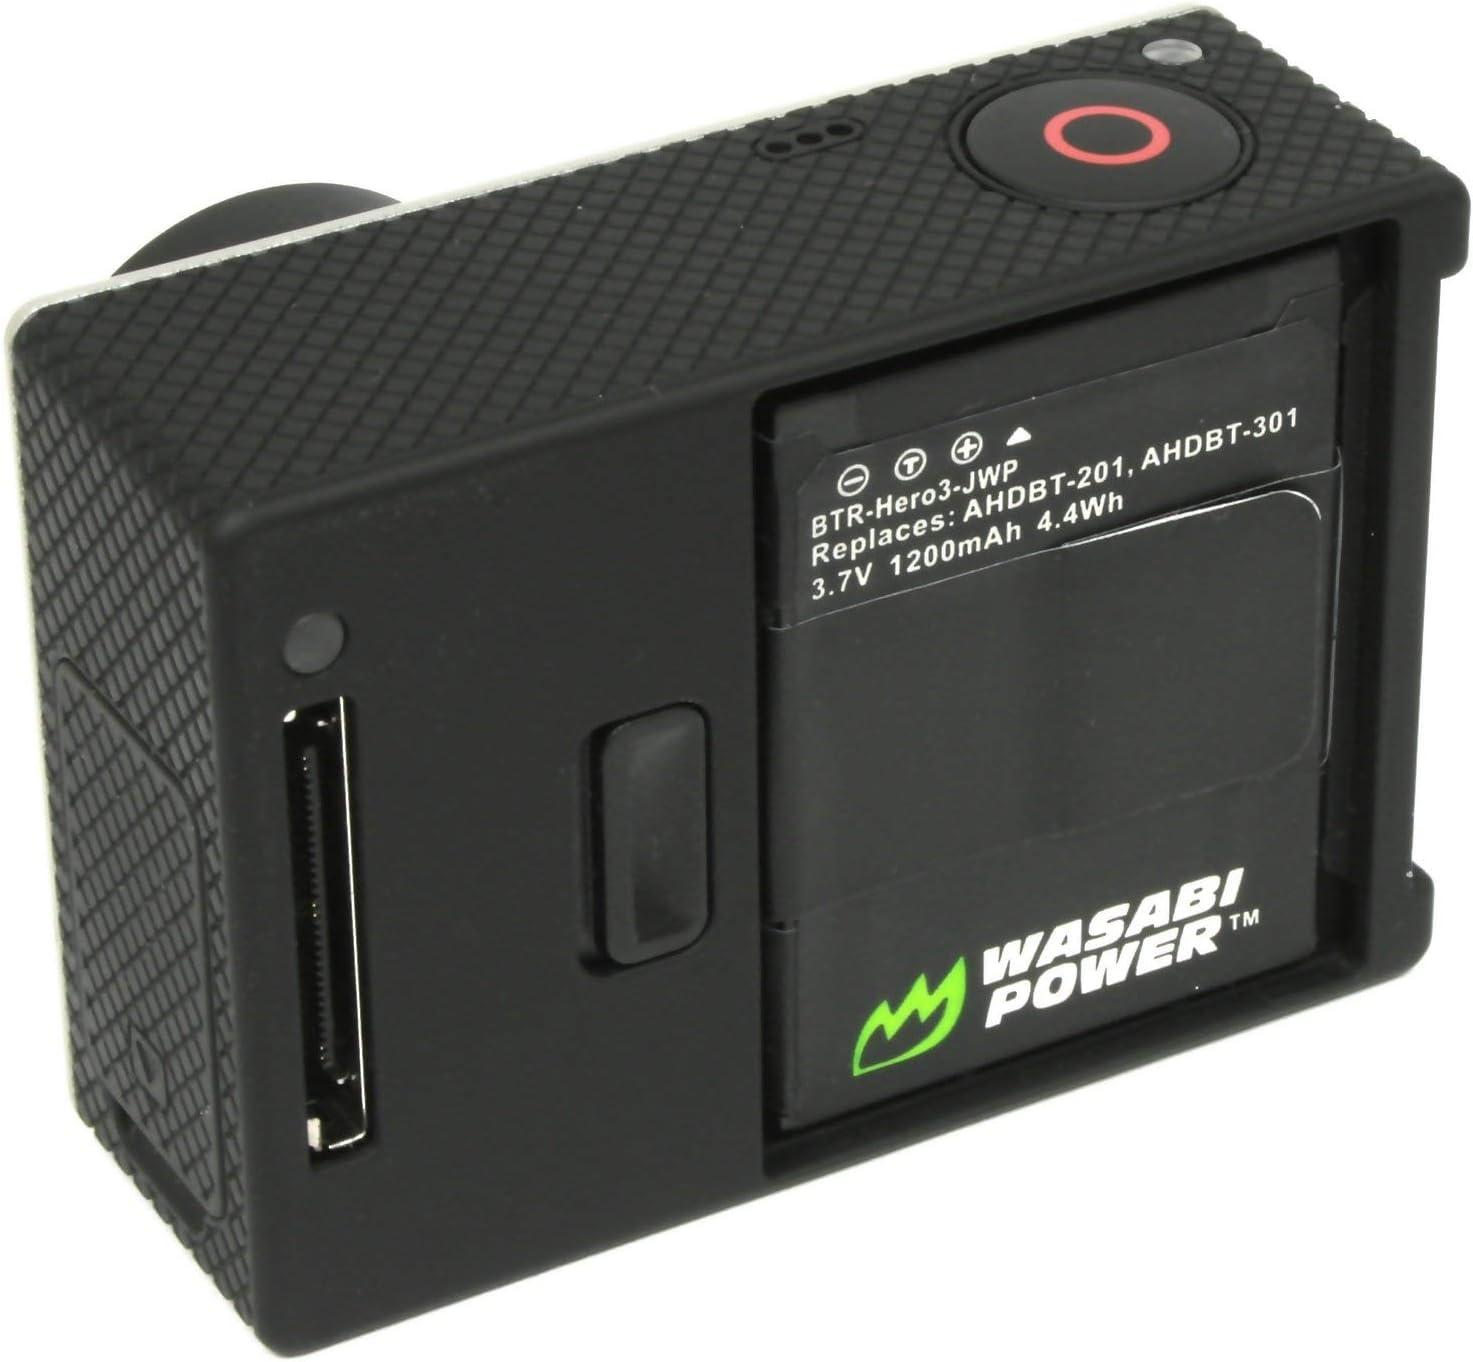 AHDBT-302 Wasabi Power Battery for GoPro HD HERO3 1200mAh AHDBT-301 HERO3+ and GoPro AHDBT-201